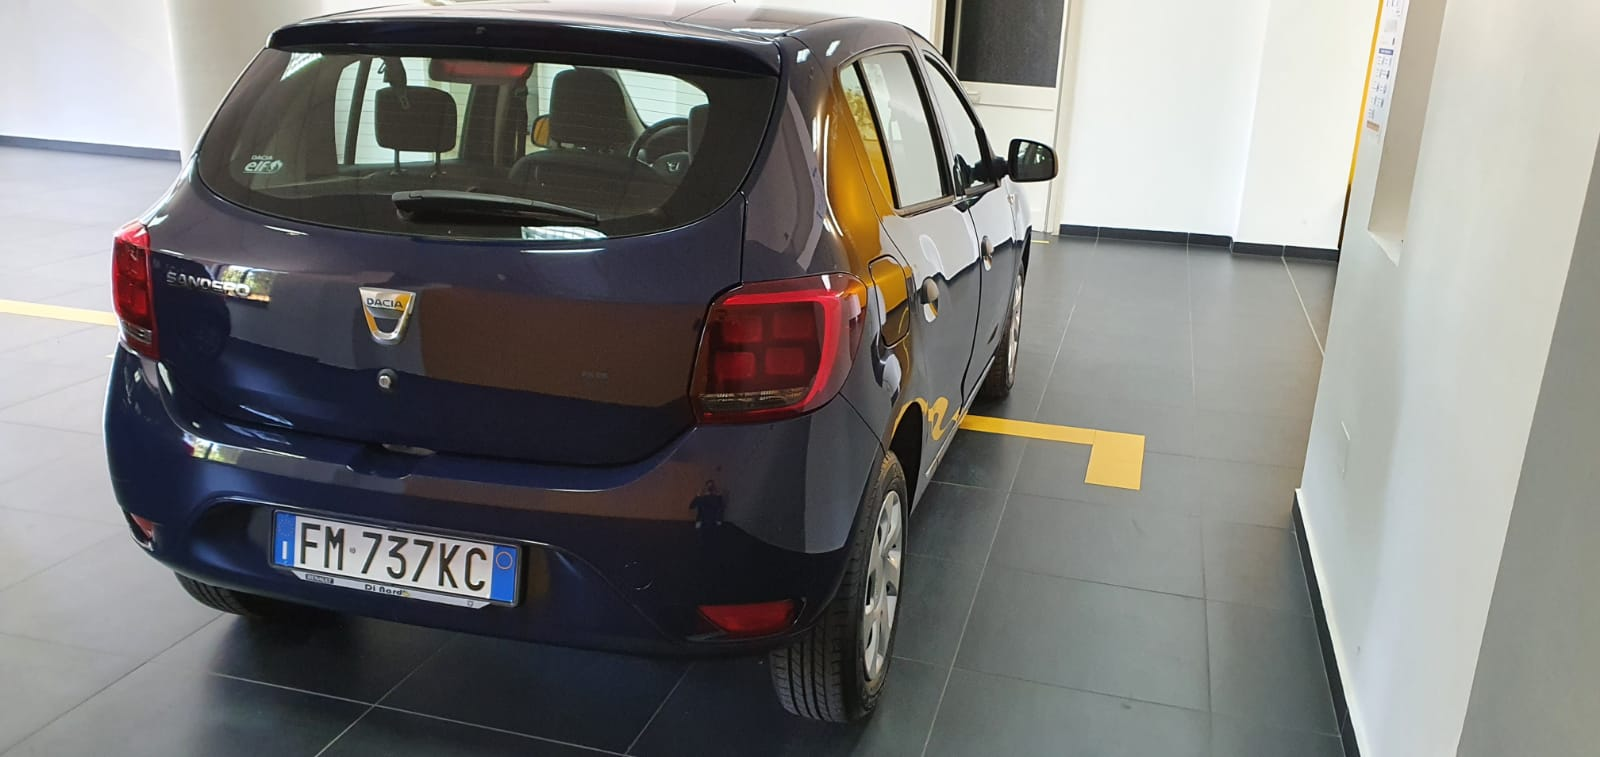 DACIA SANDERO COMFORT 1.0 SCe 12V 75CV BENZINA EURO 6 12/2017 completo